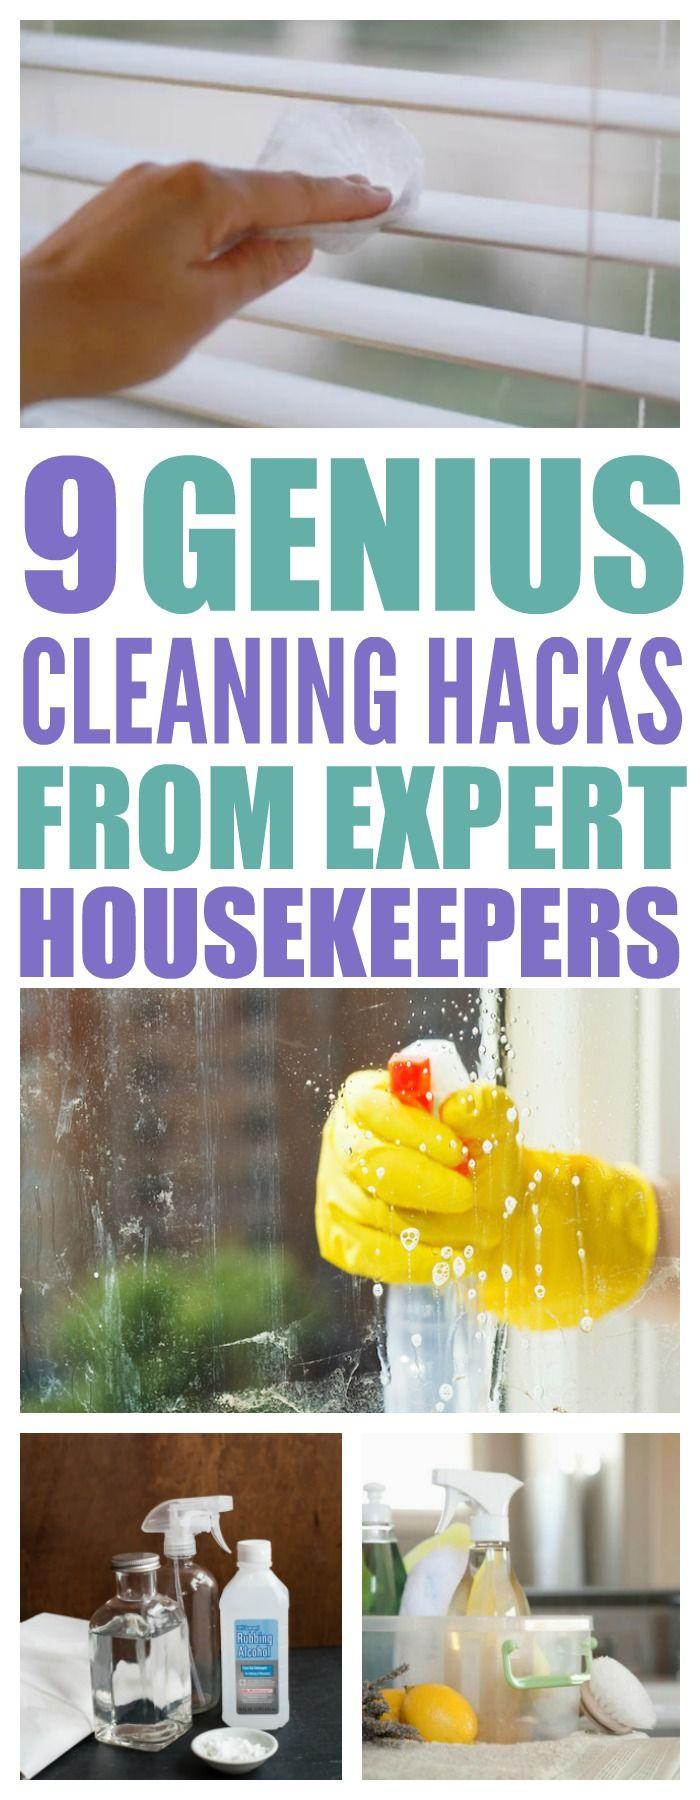 9 Genius Cleaning Hacks Used By Professional Housekeepers - That Vintage Life